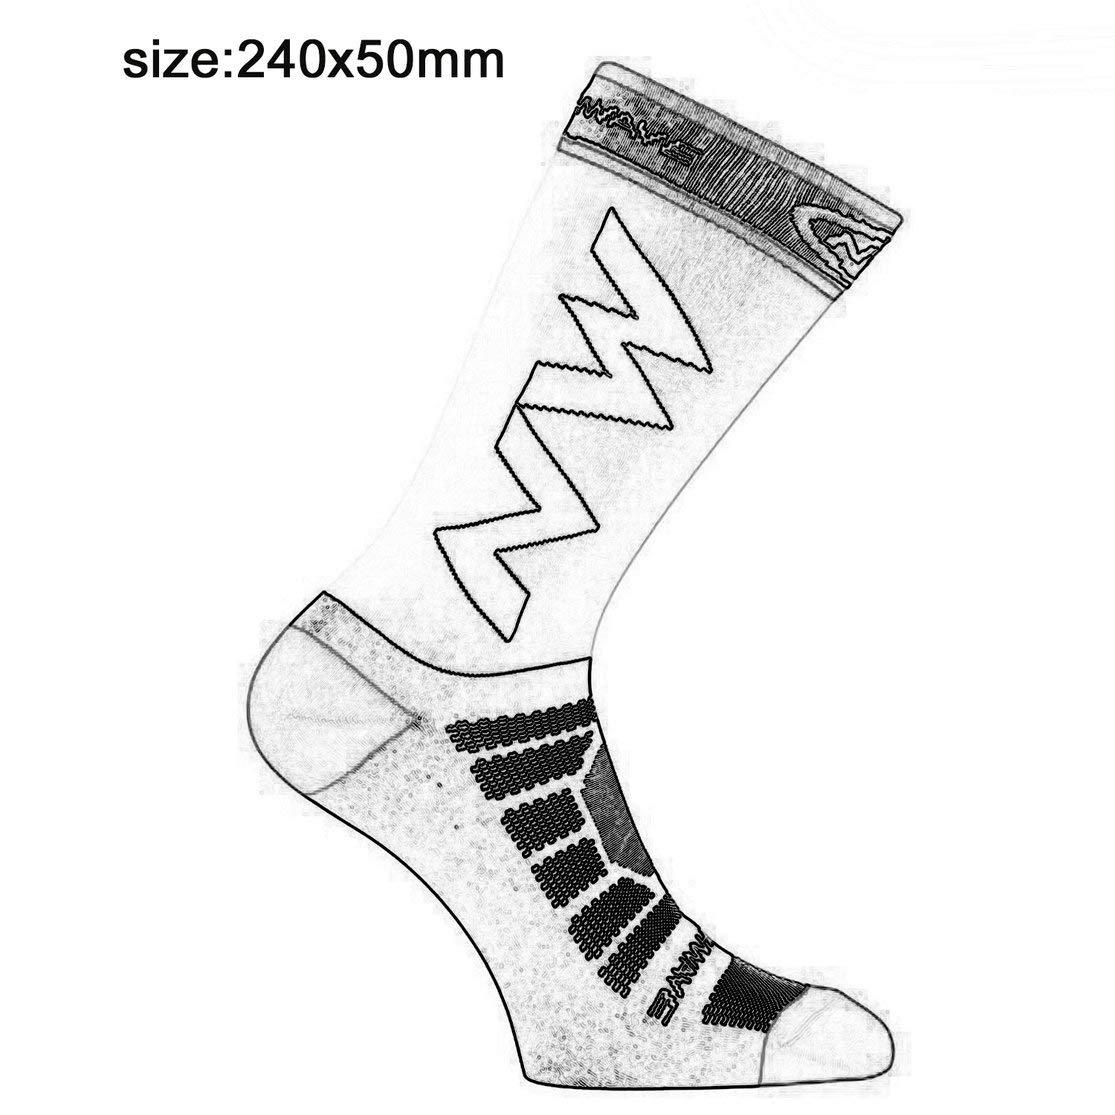 Kaemma Calcetines Largos de compresi/ón para Hombres Adultos Transpirables Calcetines de f/útbol c/álidos Baloncesto Deportes Antideslizante Ciclismo Escalada Correr Calcetines